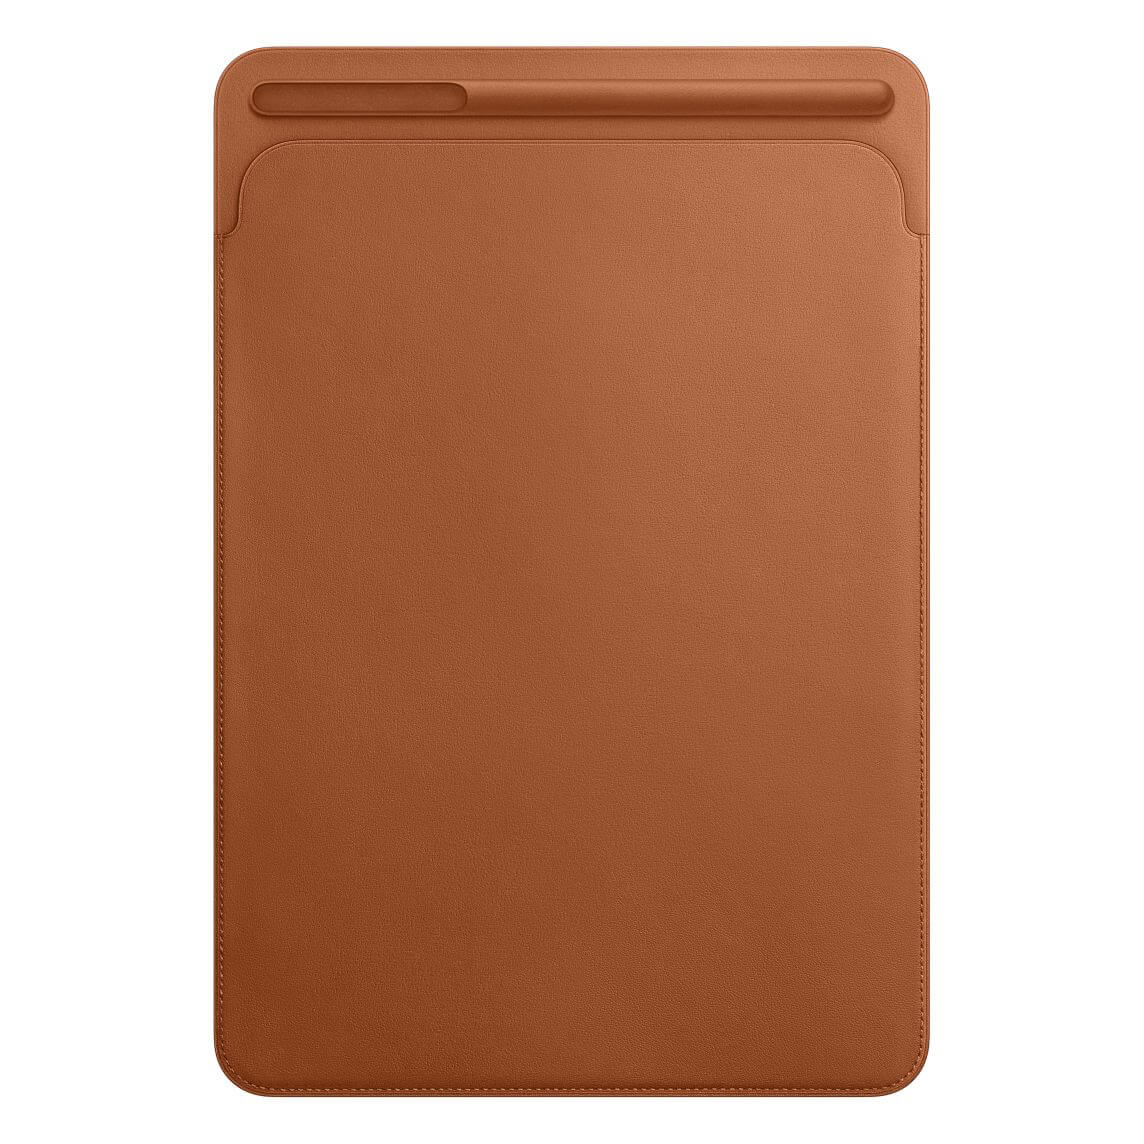 "Nahkatasku iPad Prolle 10,5"" - satulanruskea"